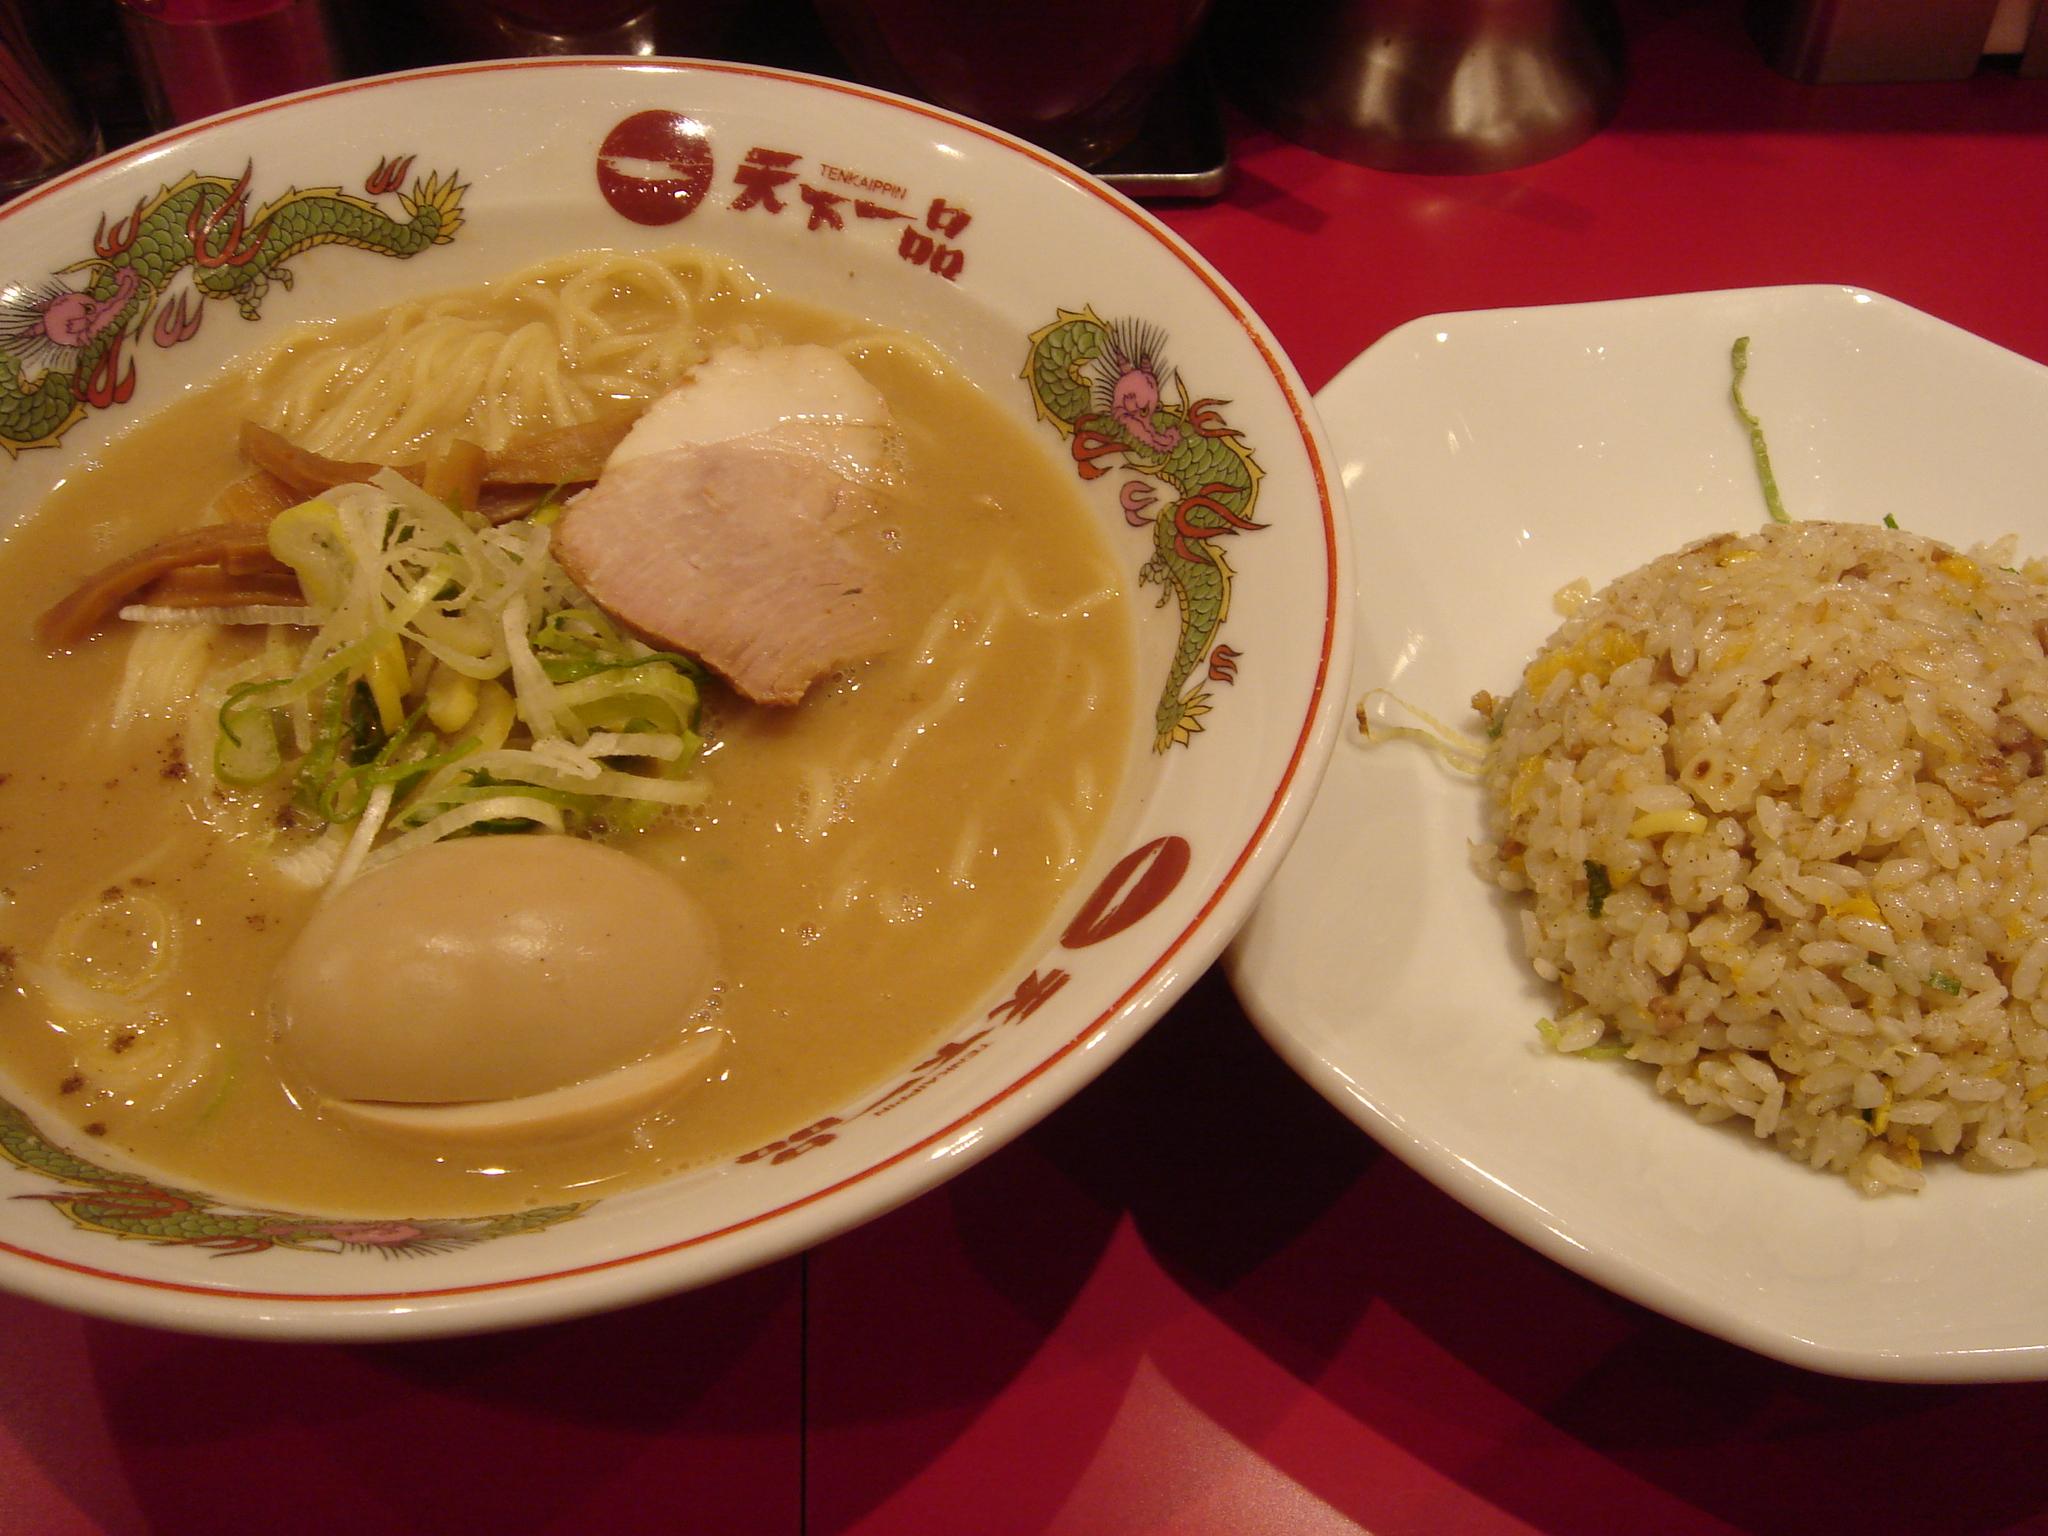 Ramen and fried rice by shibainu in kichijyoji%2c tokyo